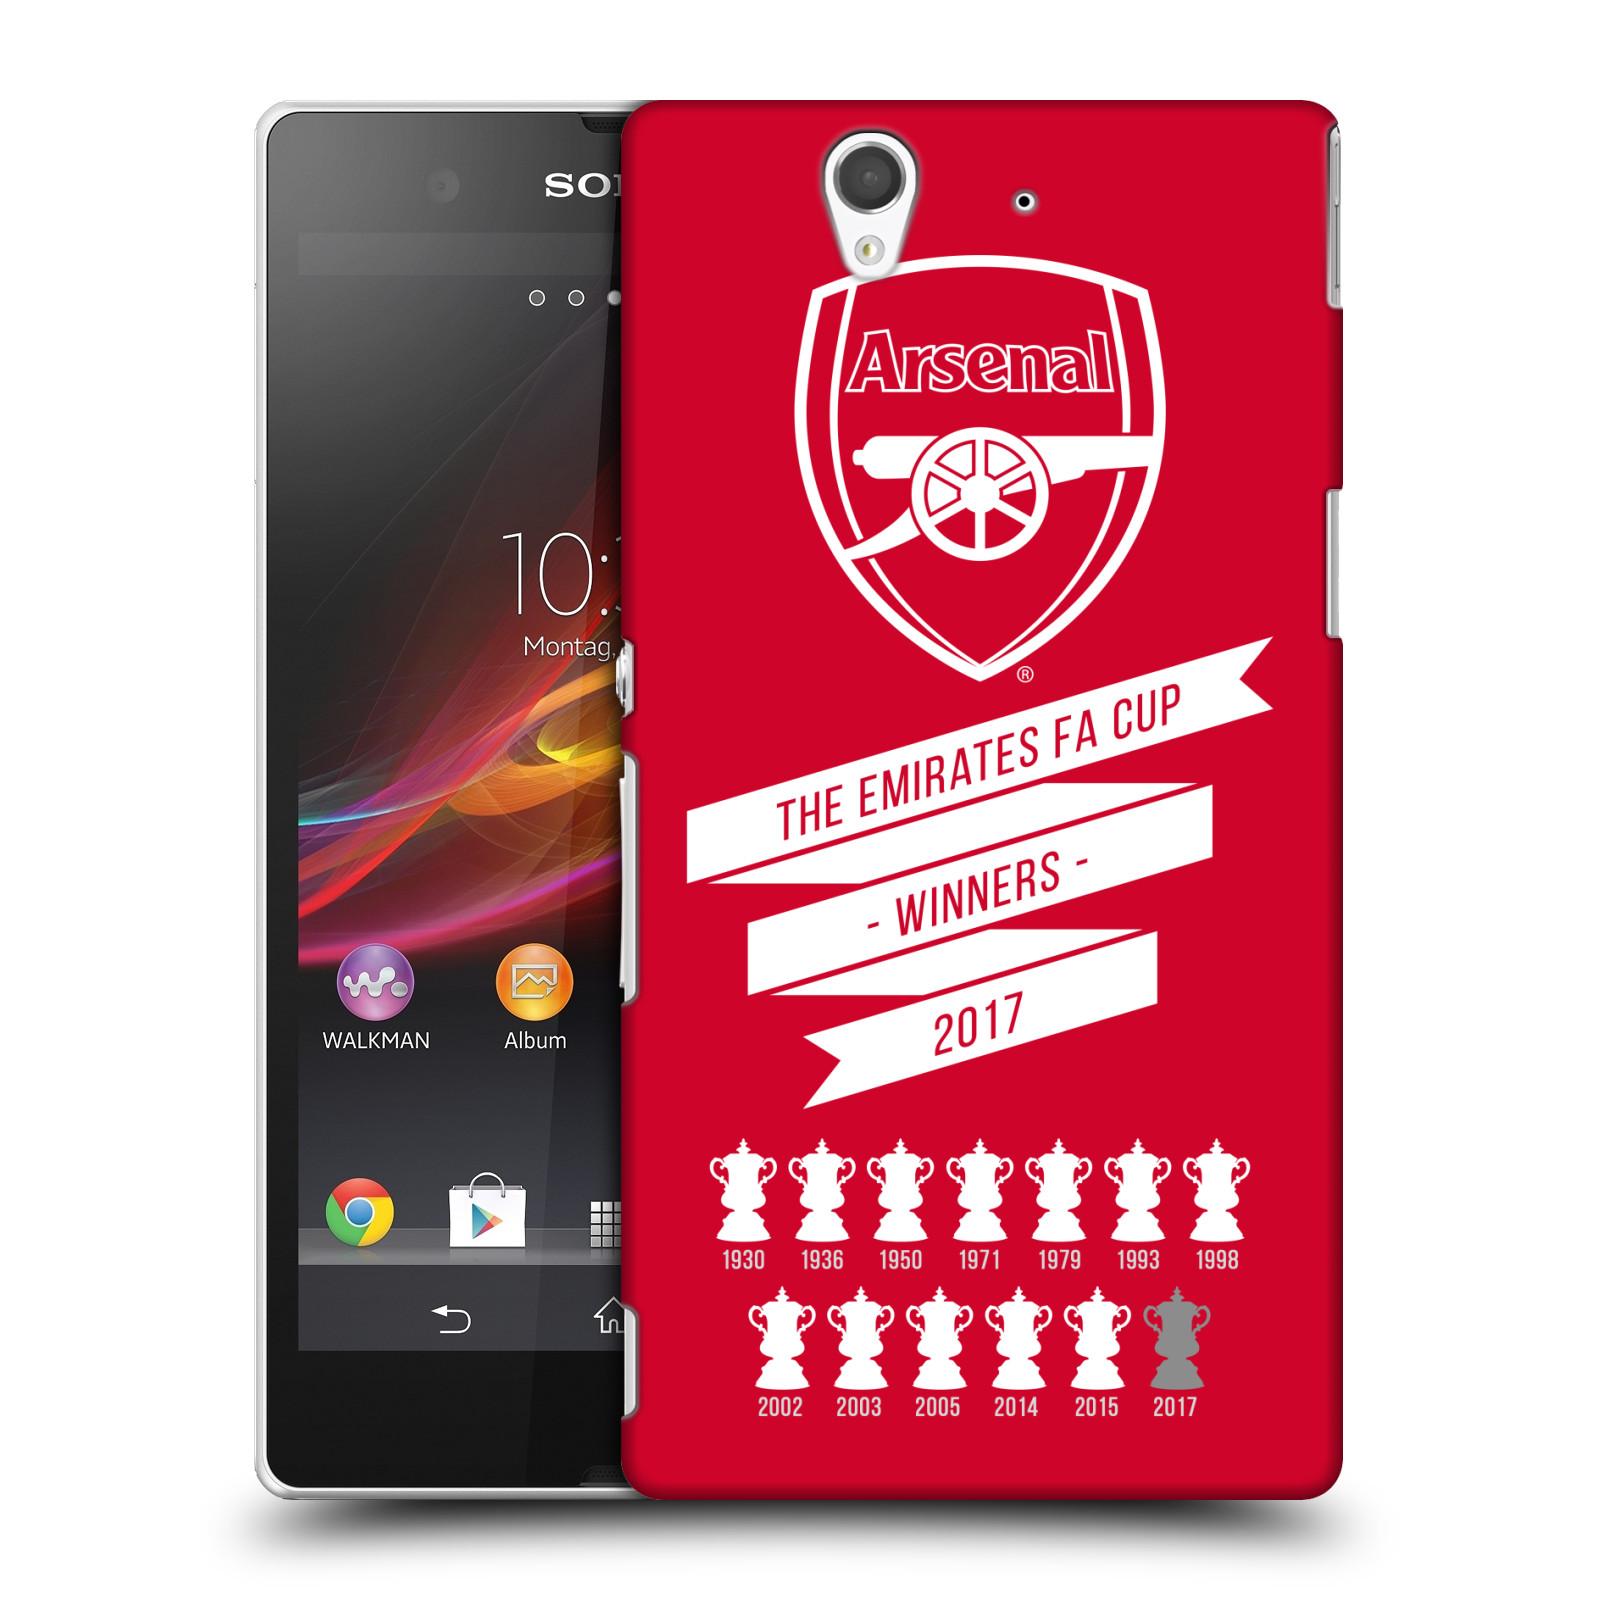 Plastové pouzdro na mobil Sony Xperia Z C6603 - Head Case - Arsenal FC - 13 Wins